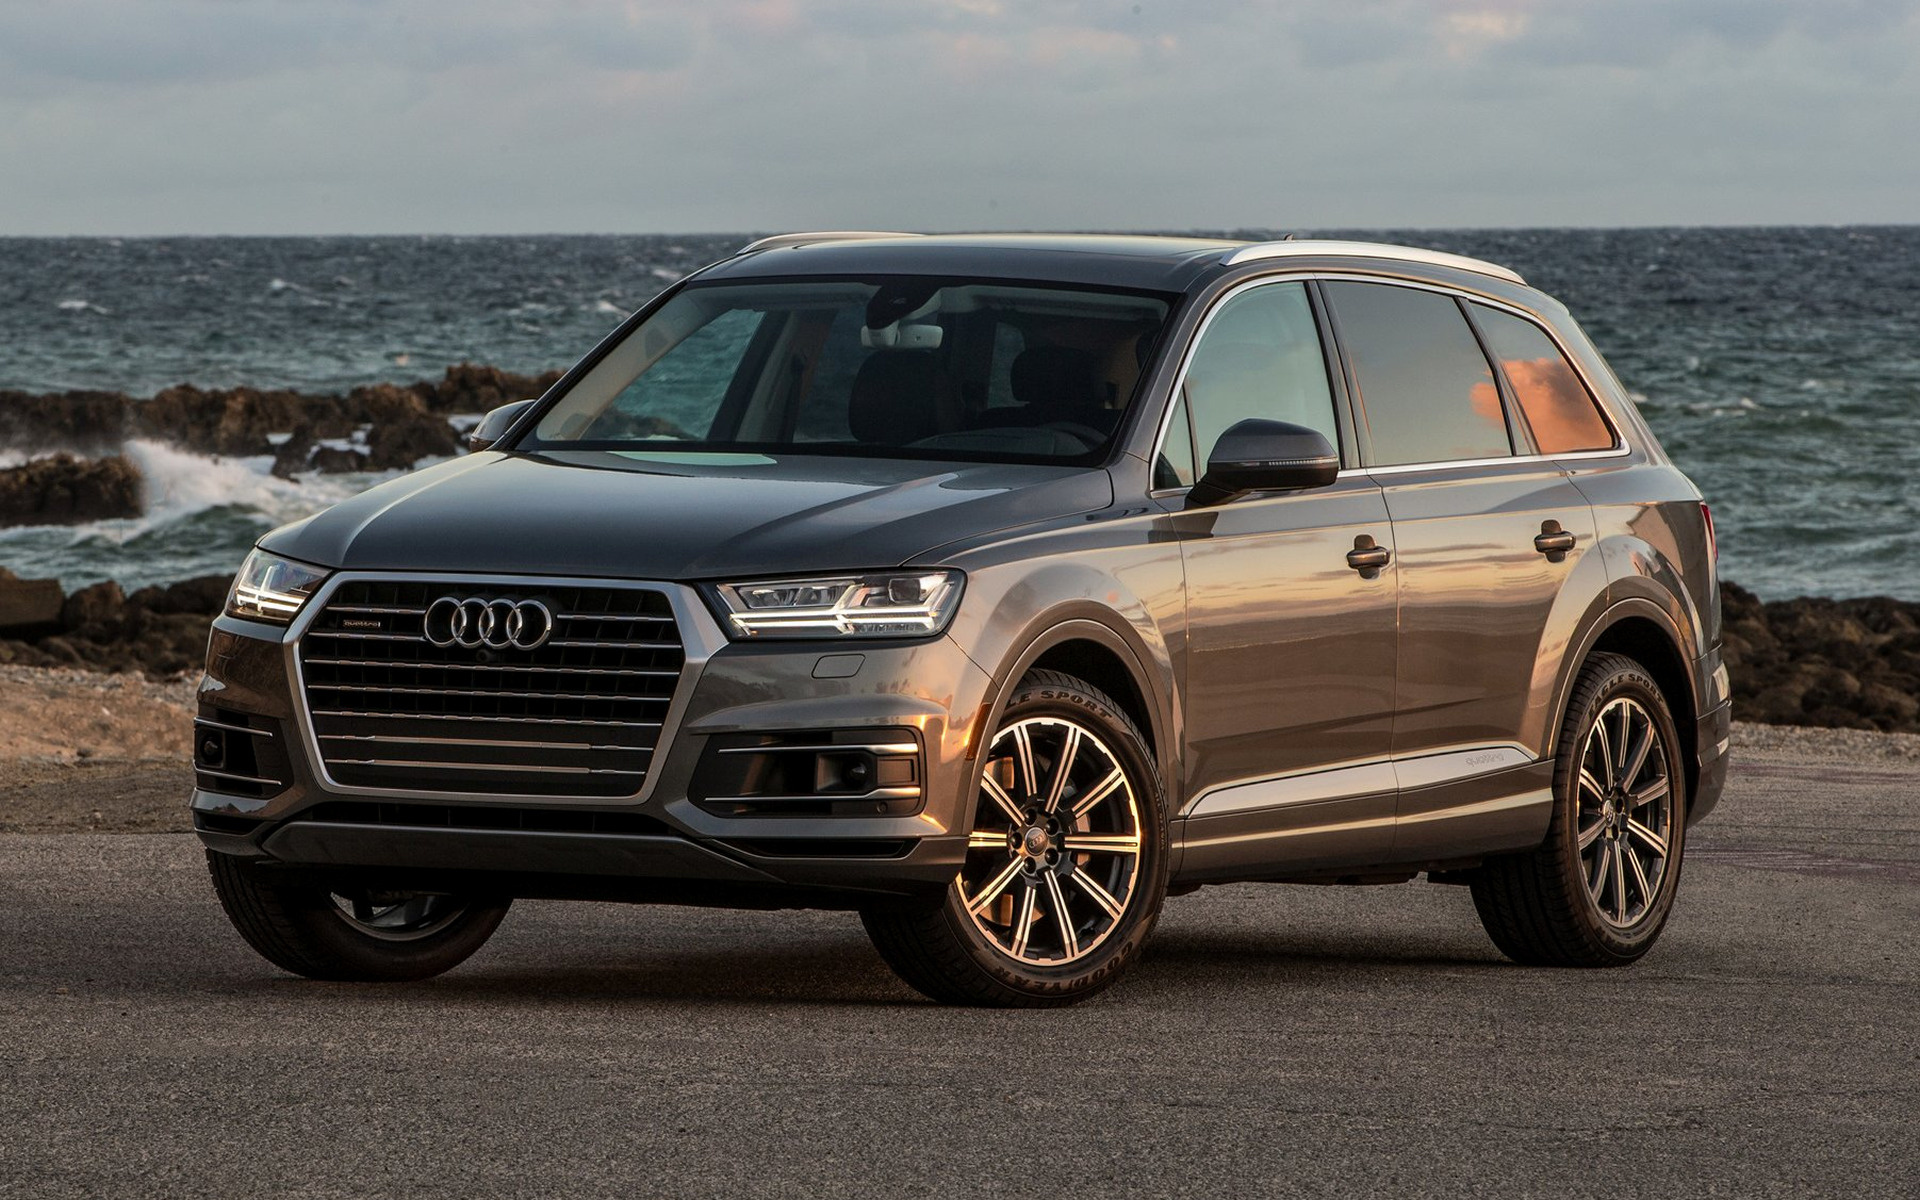 2017 Dodge Ram >> 2017 Audi Q7 (US) - Wallpapers and HD Images | Car Pixel